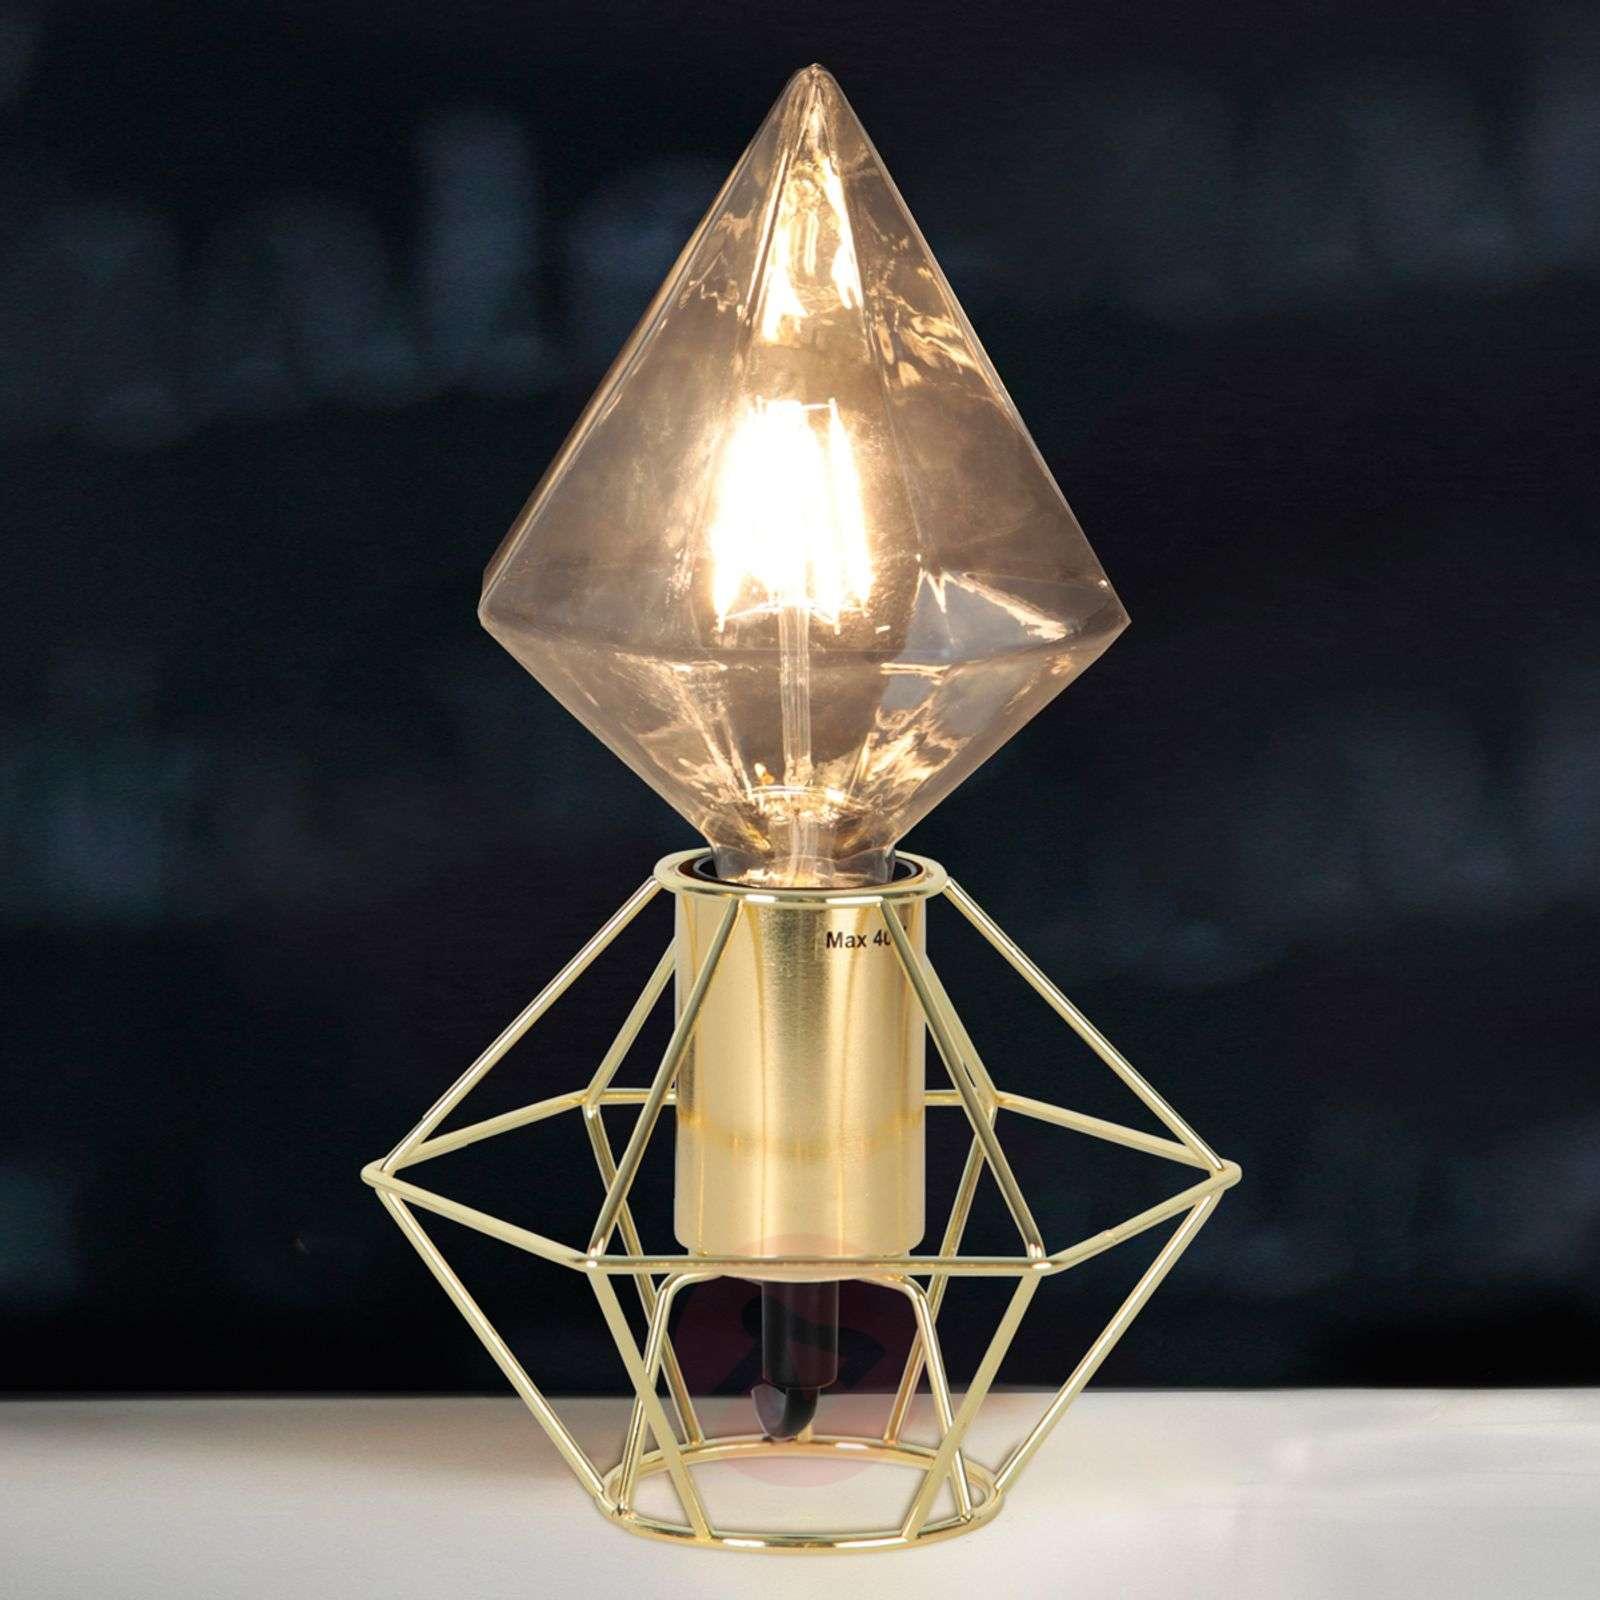 Timantinmuotoinen LED-lamppu E27 3,2W 827-1523009-01